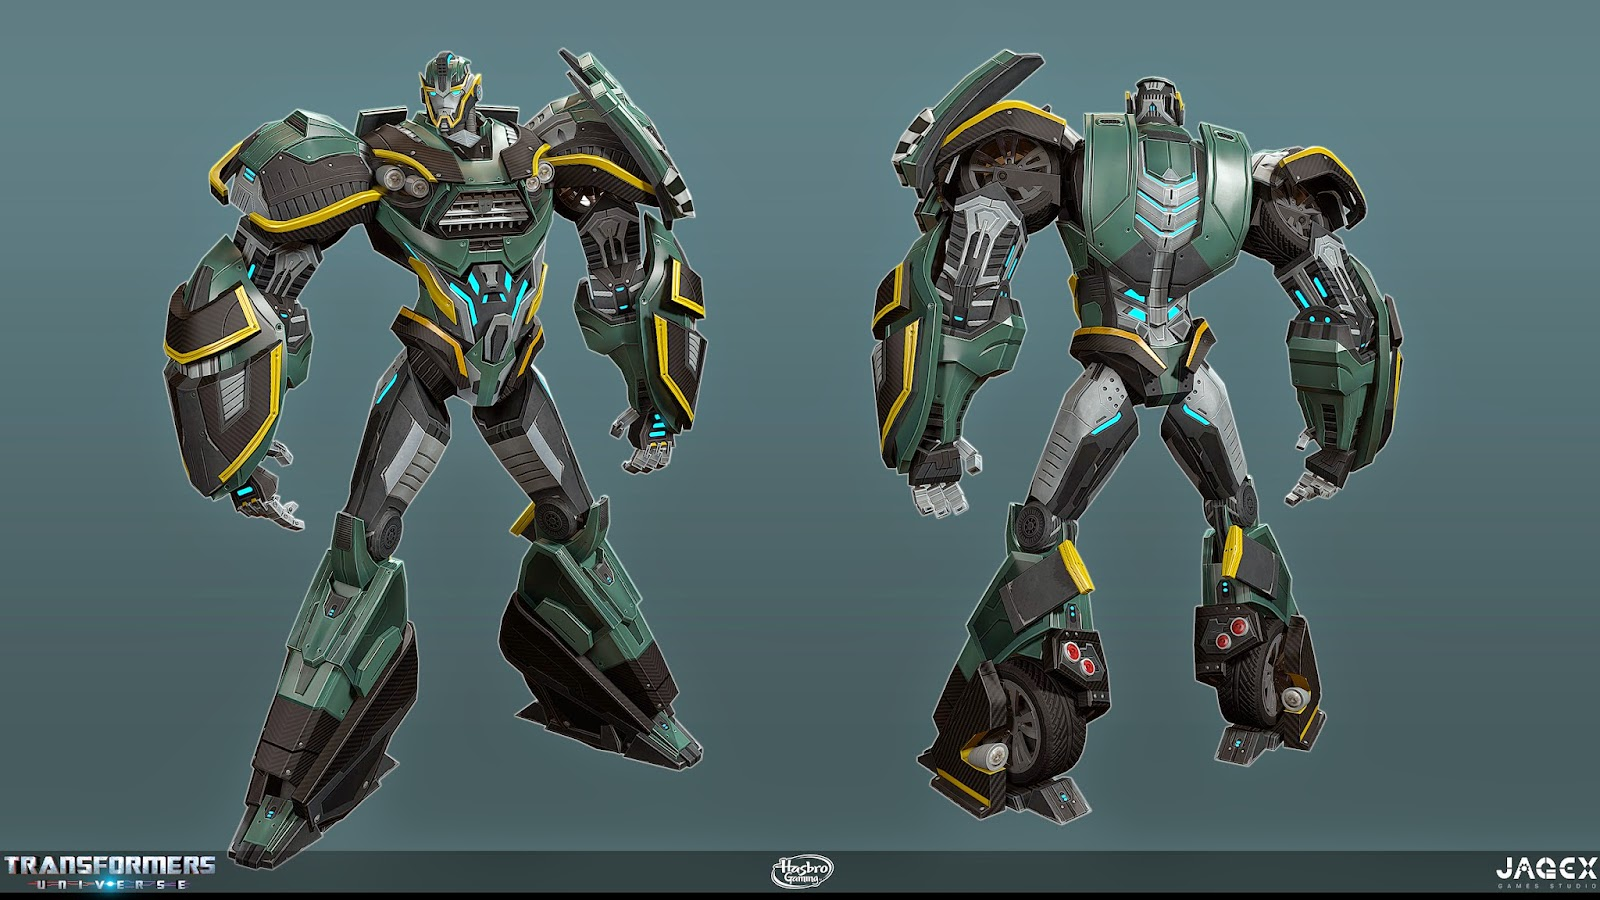 jagex transformers universe concept artwork including